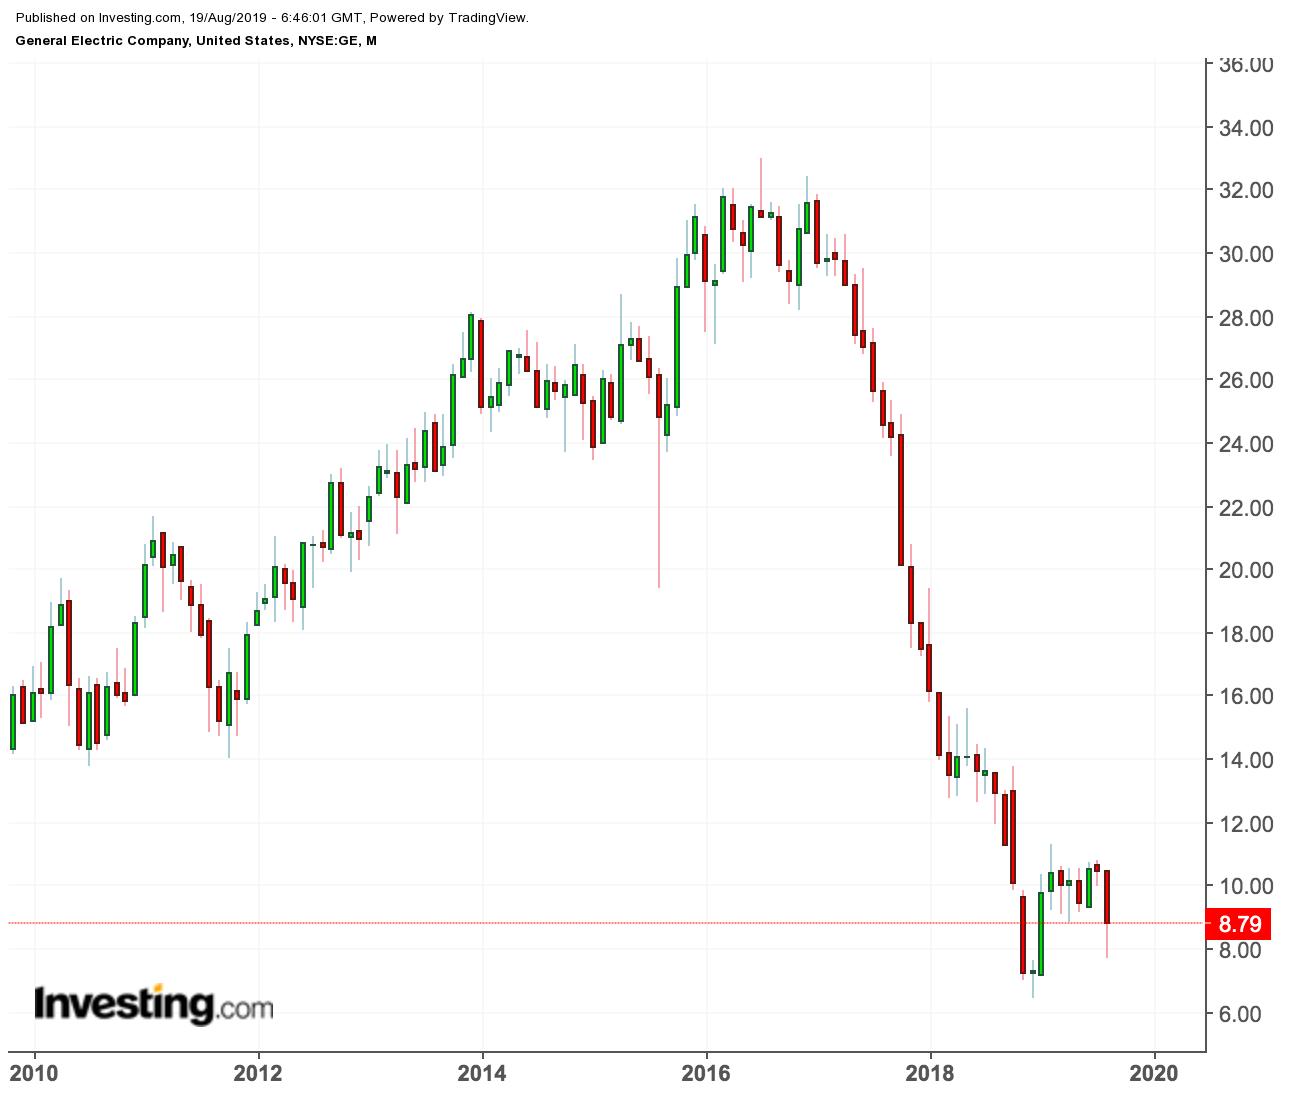 Short Seller Attack On Ge Shows Stock Is Still Vulnerable